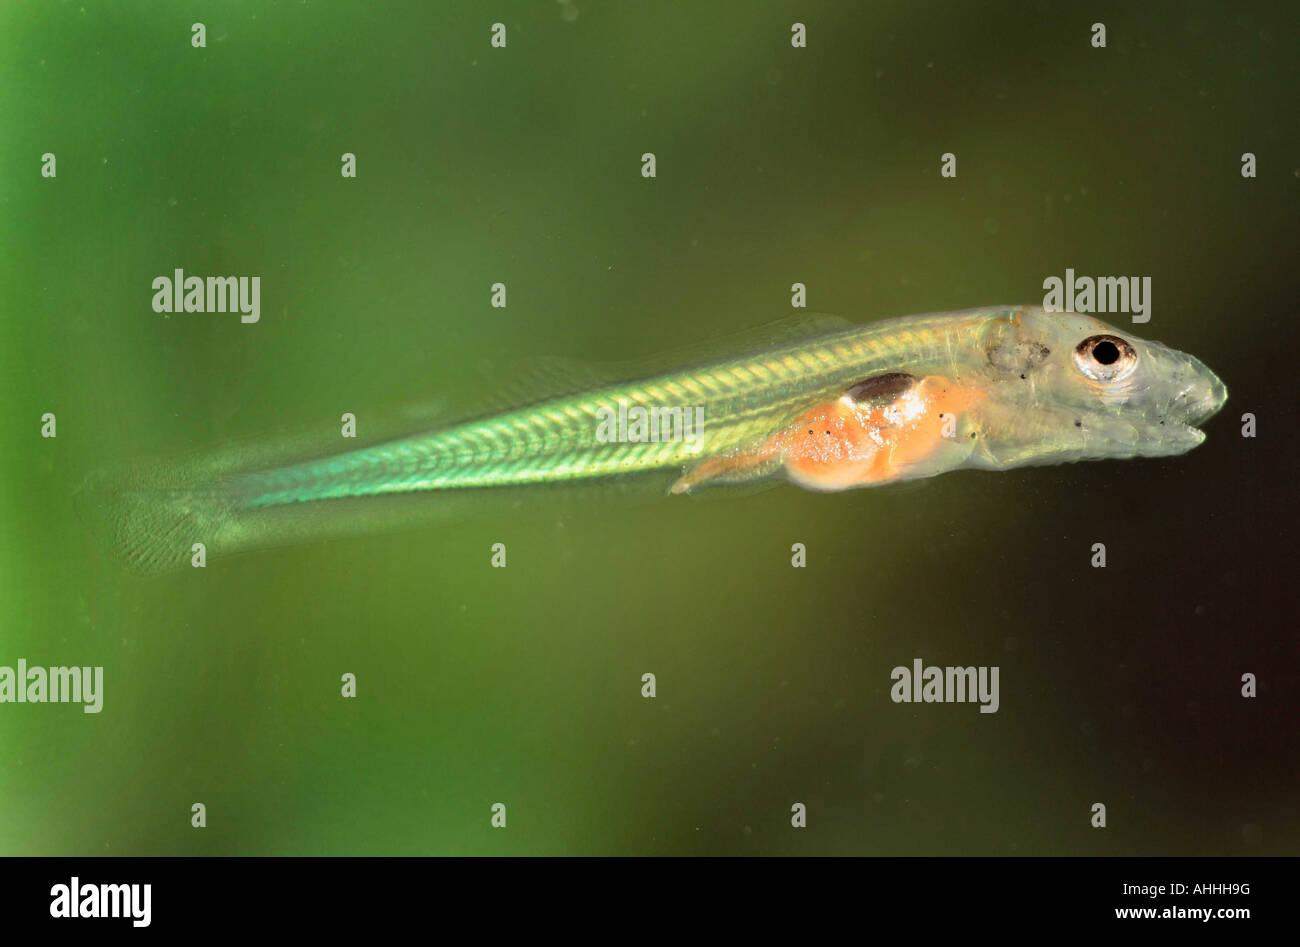 asper, Rhne-streber, Rhone streber (Zingel asper), larva after first feed, Germany, Bavaria - Stock Image